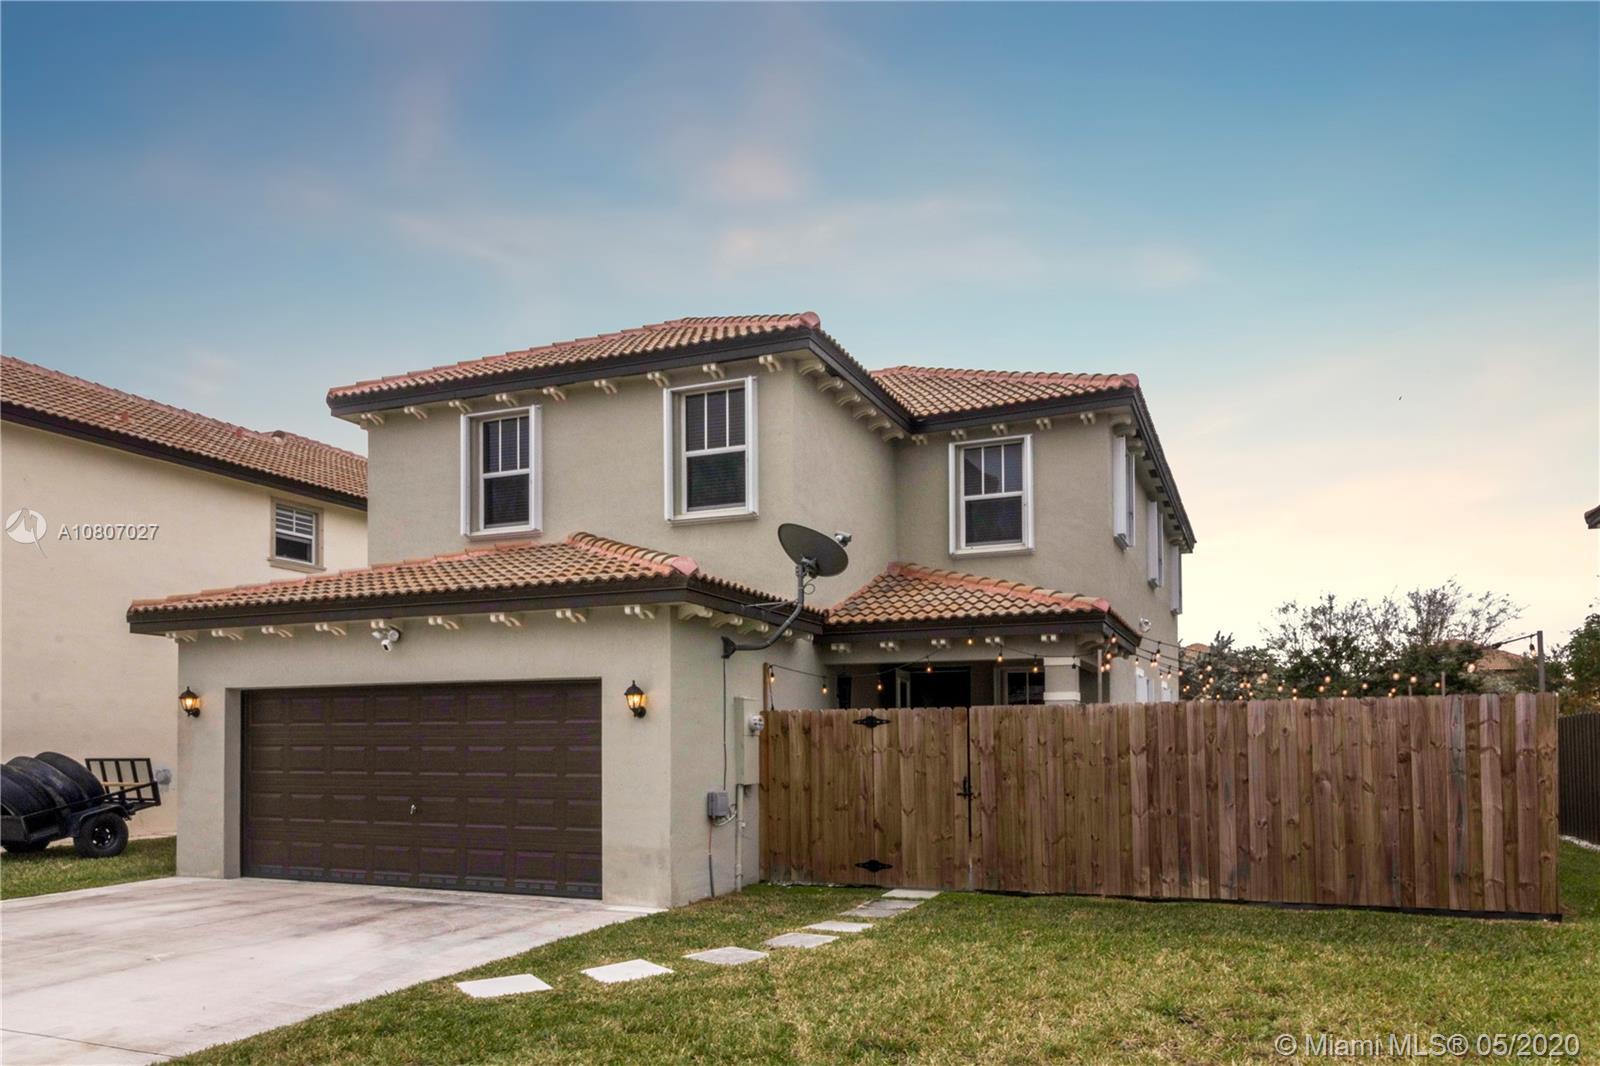 11473 SW 244th Ln, Homestead, FL 33032 - Homestead, FL real estate listing